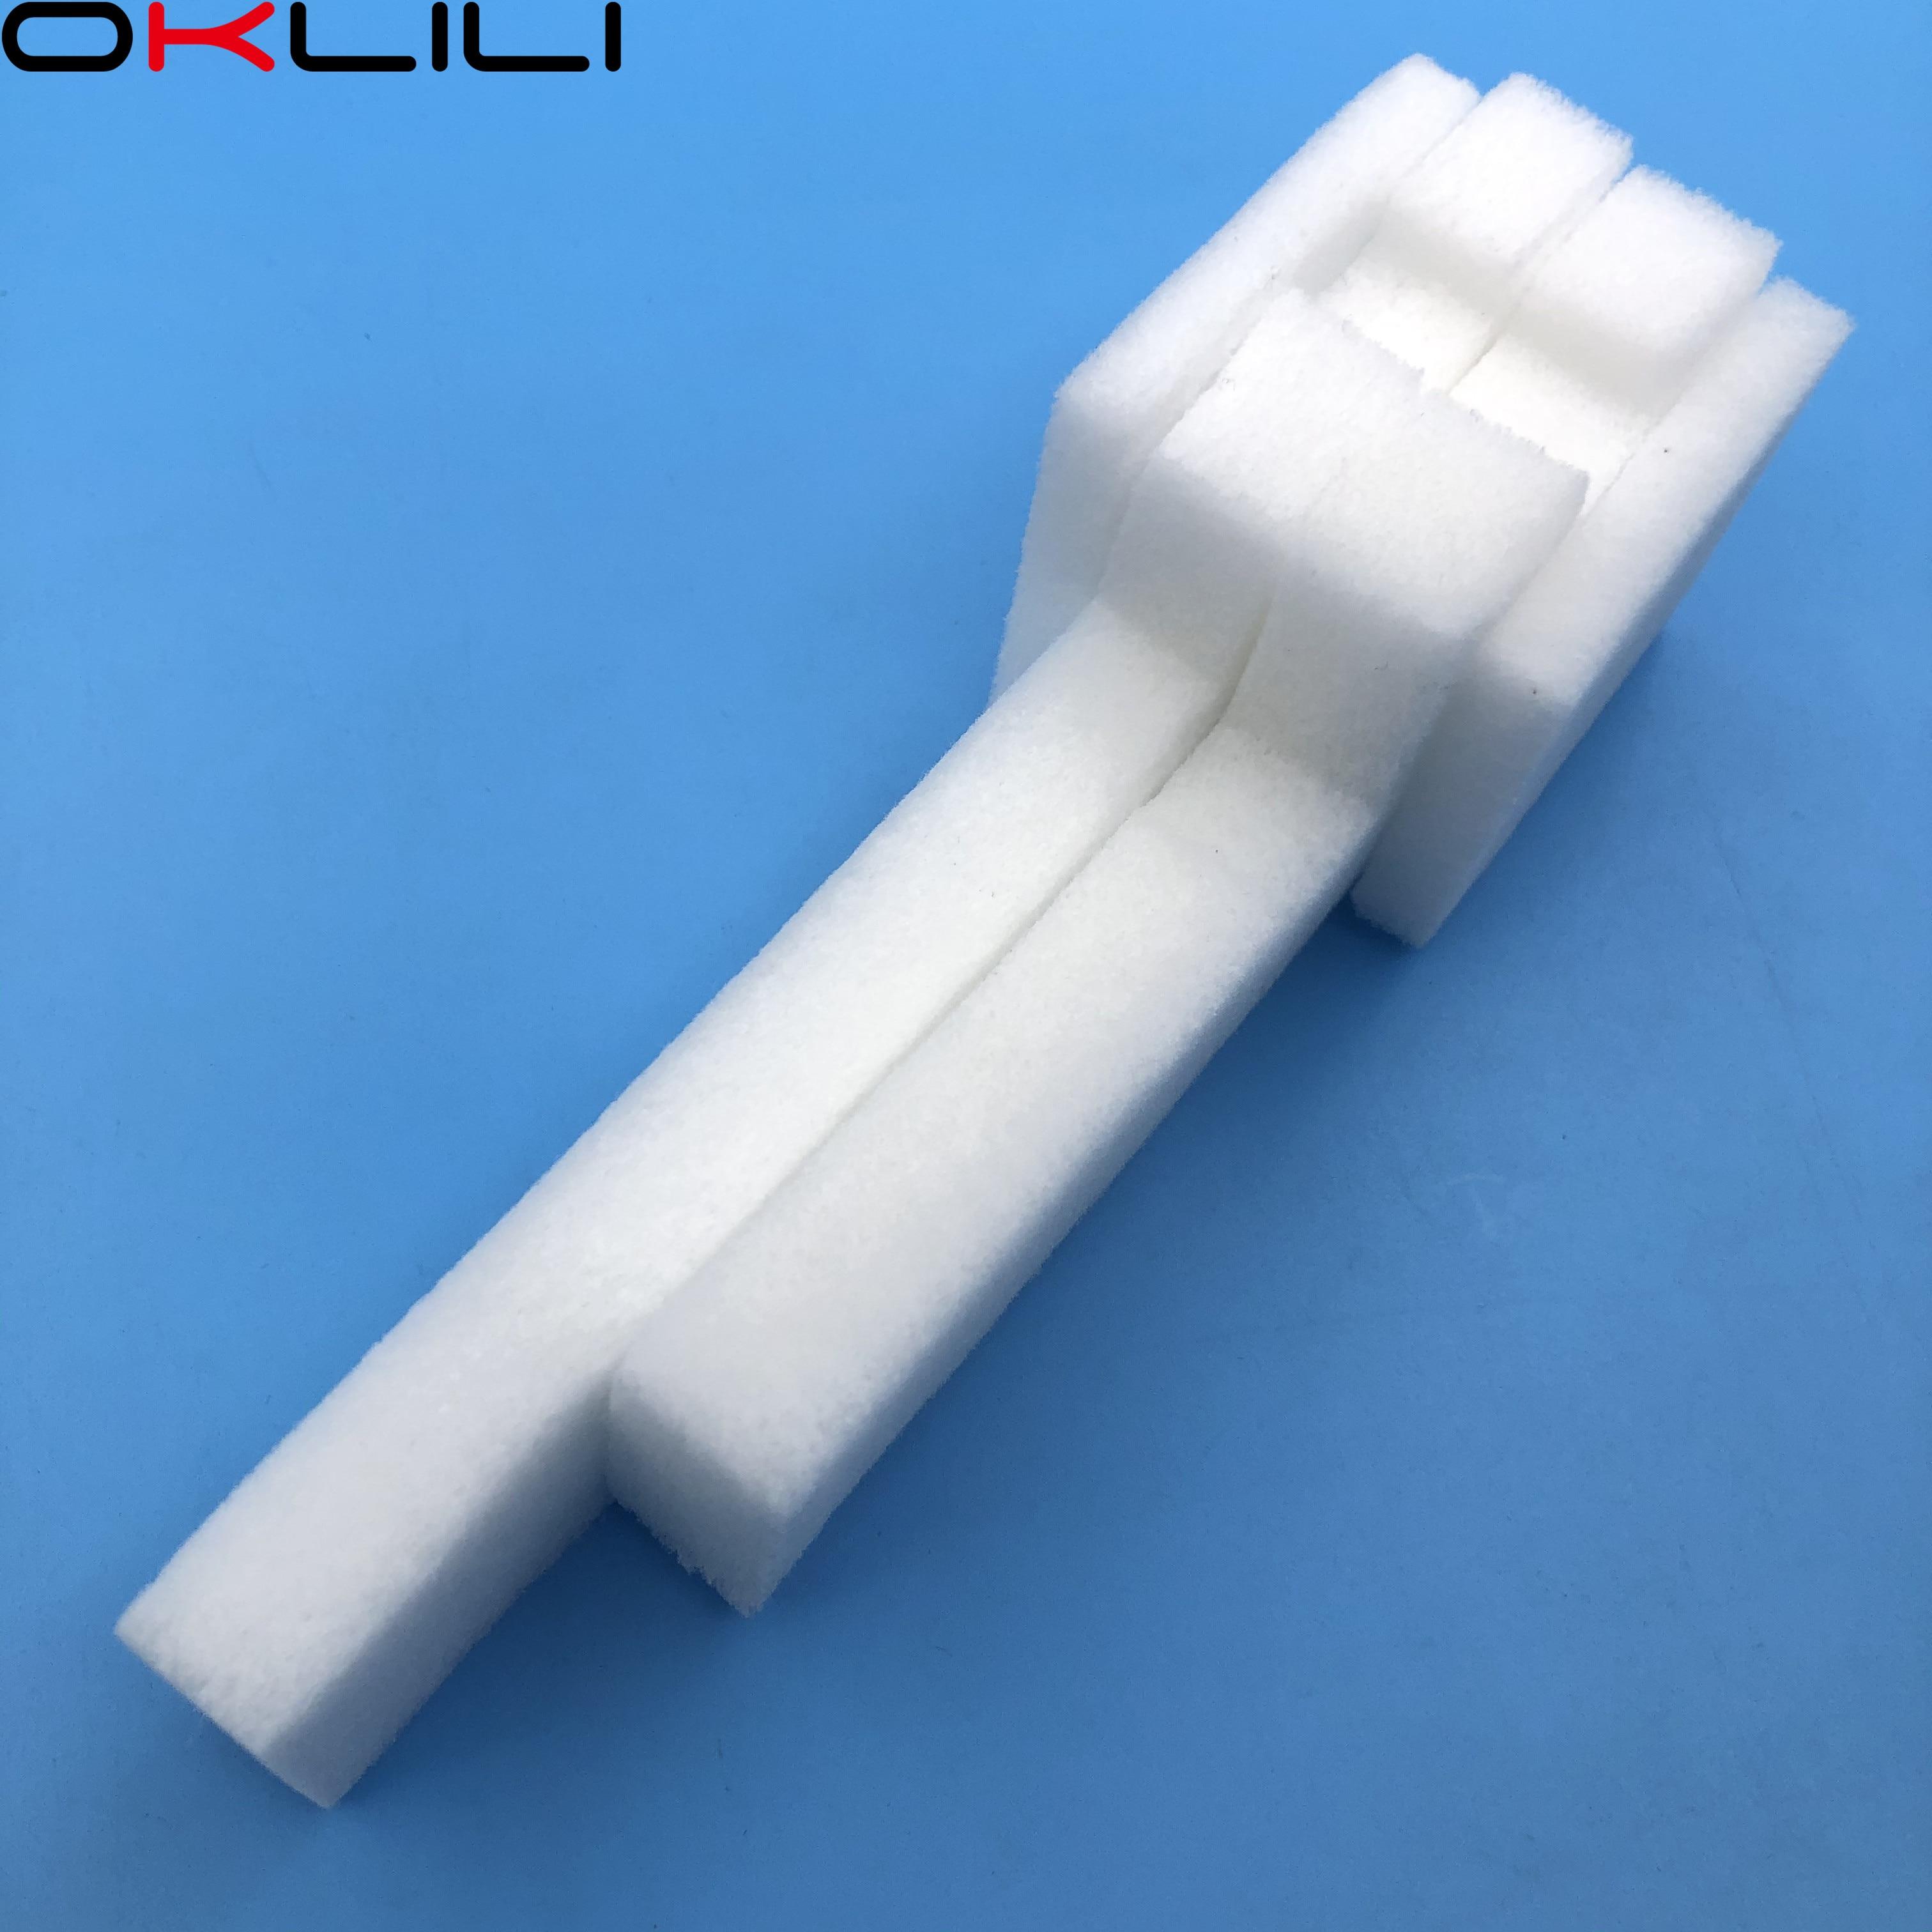 1X Waste Ink Tank Pad Sponge For Epson L110 L111 L120 L130 L132 L210 L211 L220 L222 L300 L301 L303 L310 L313 L350 L351 L353 L355